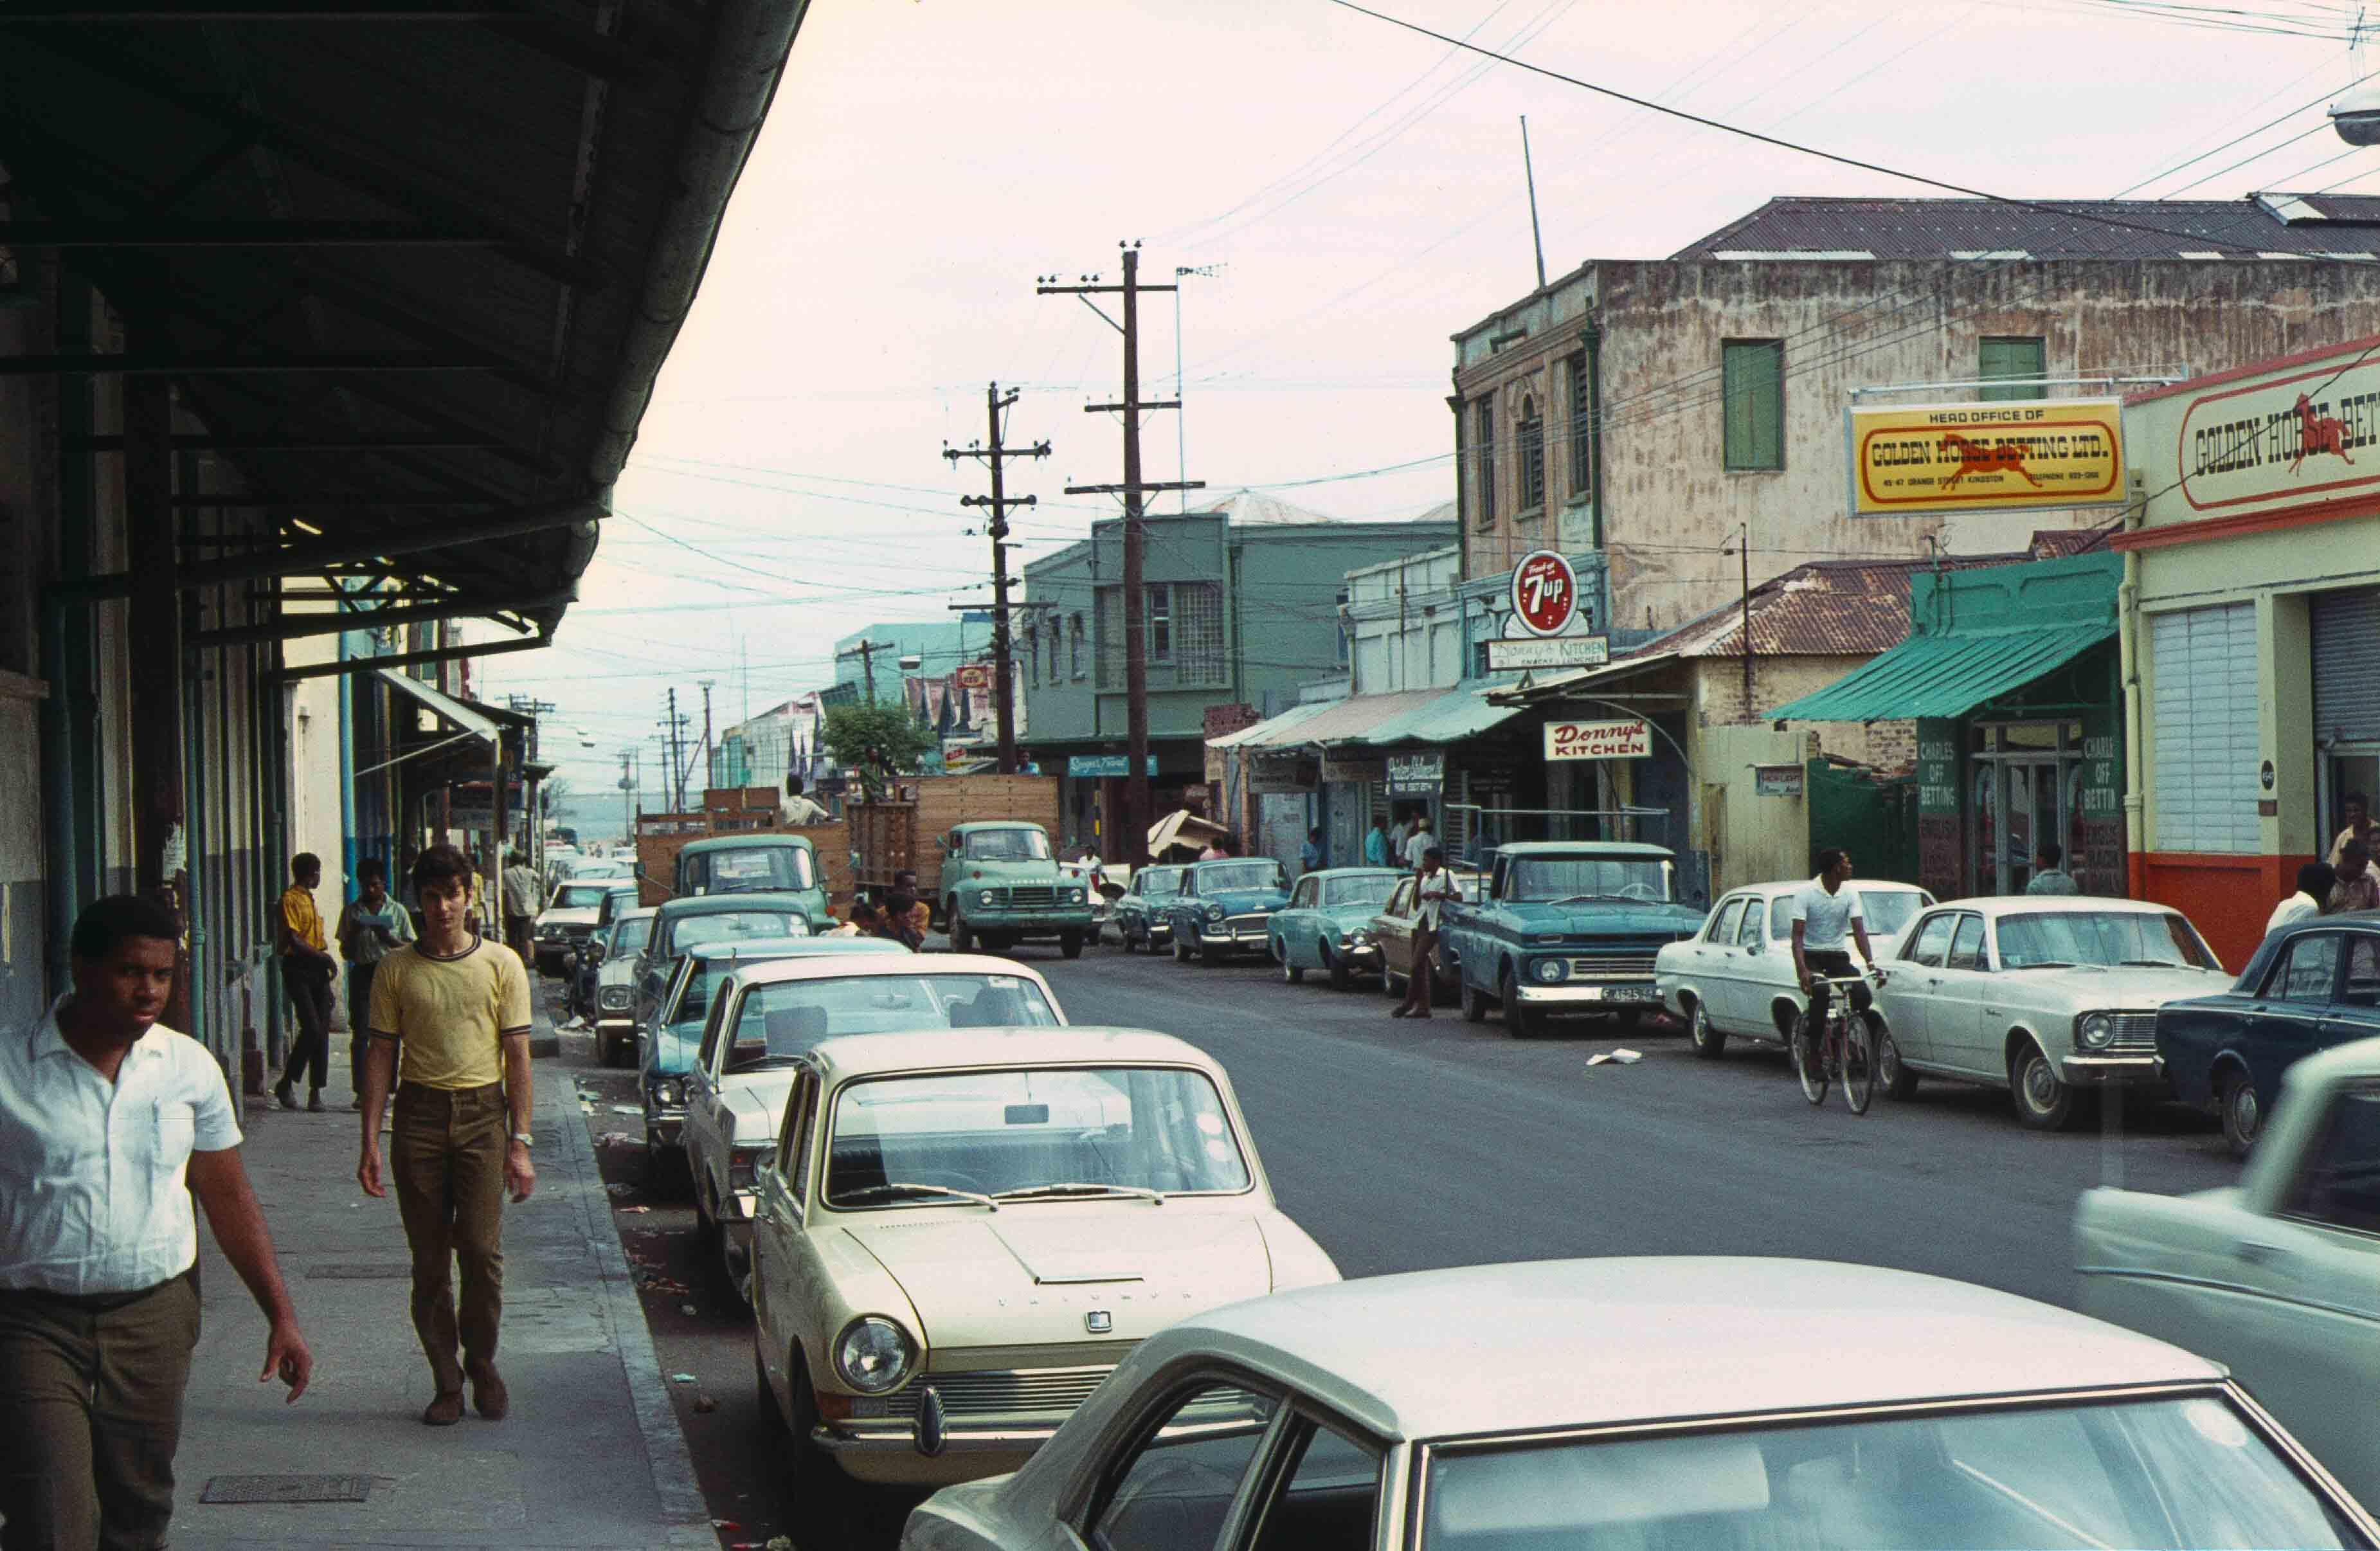 672. Suriname